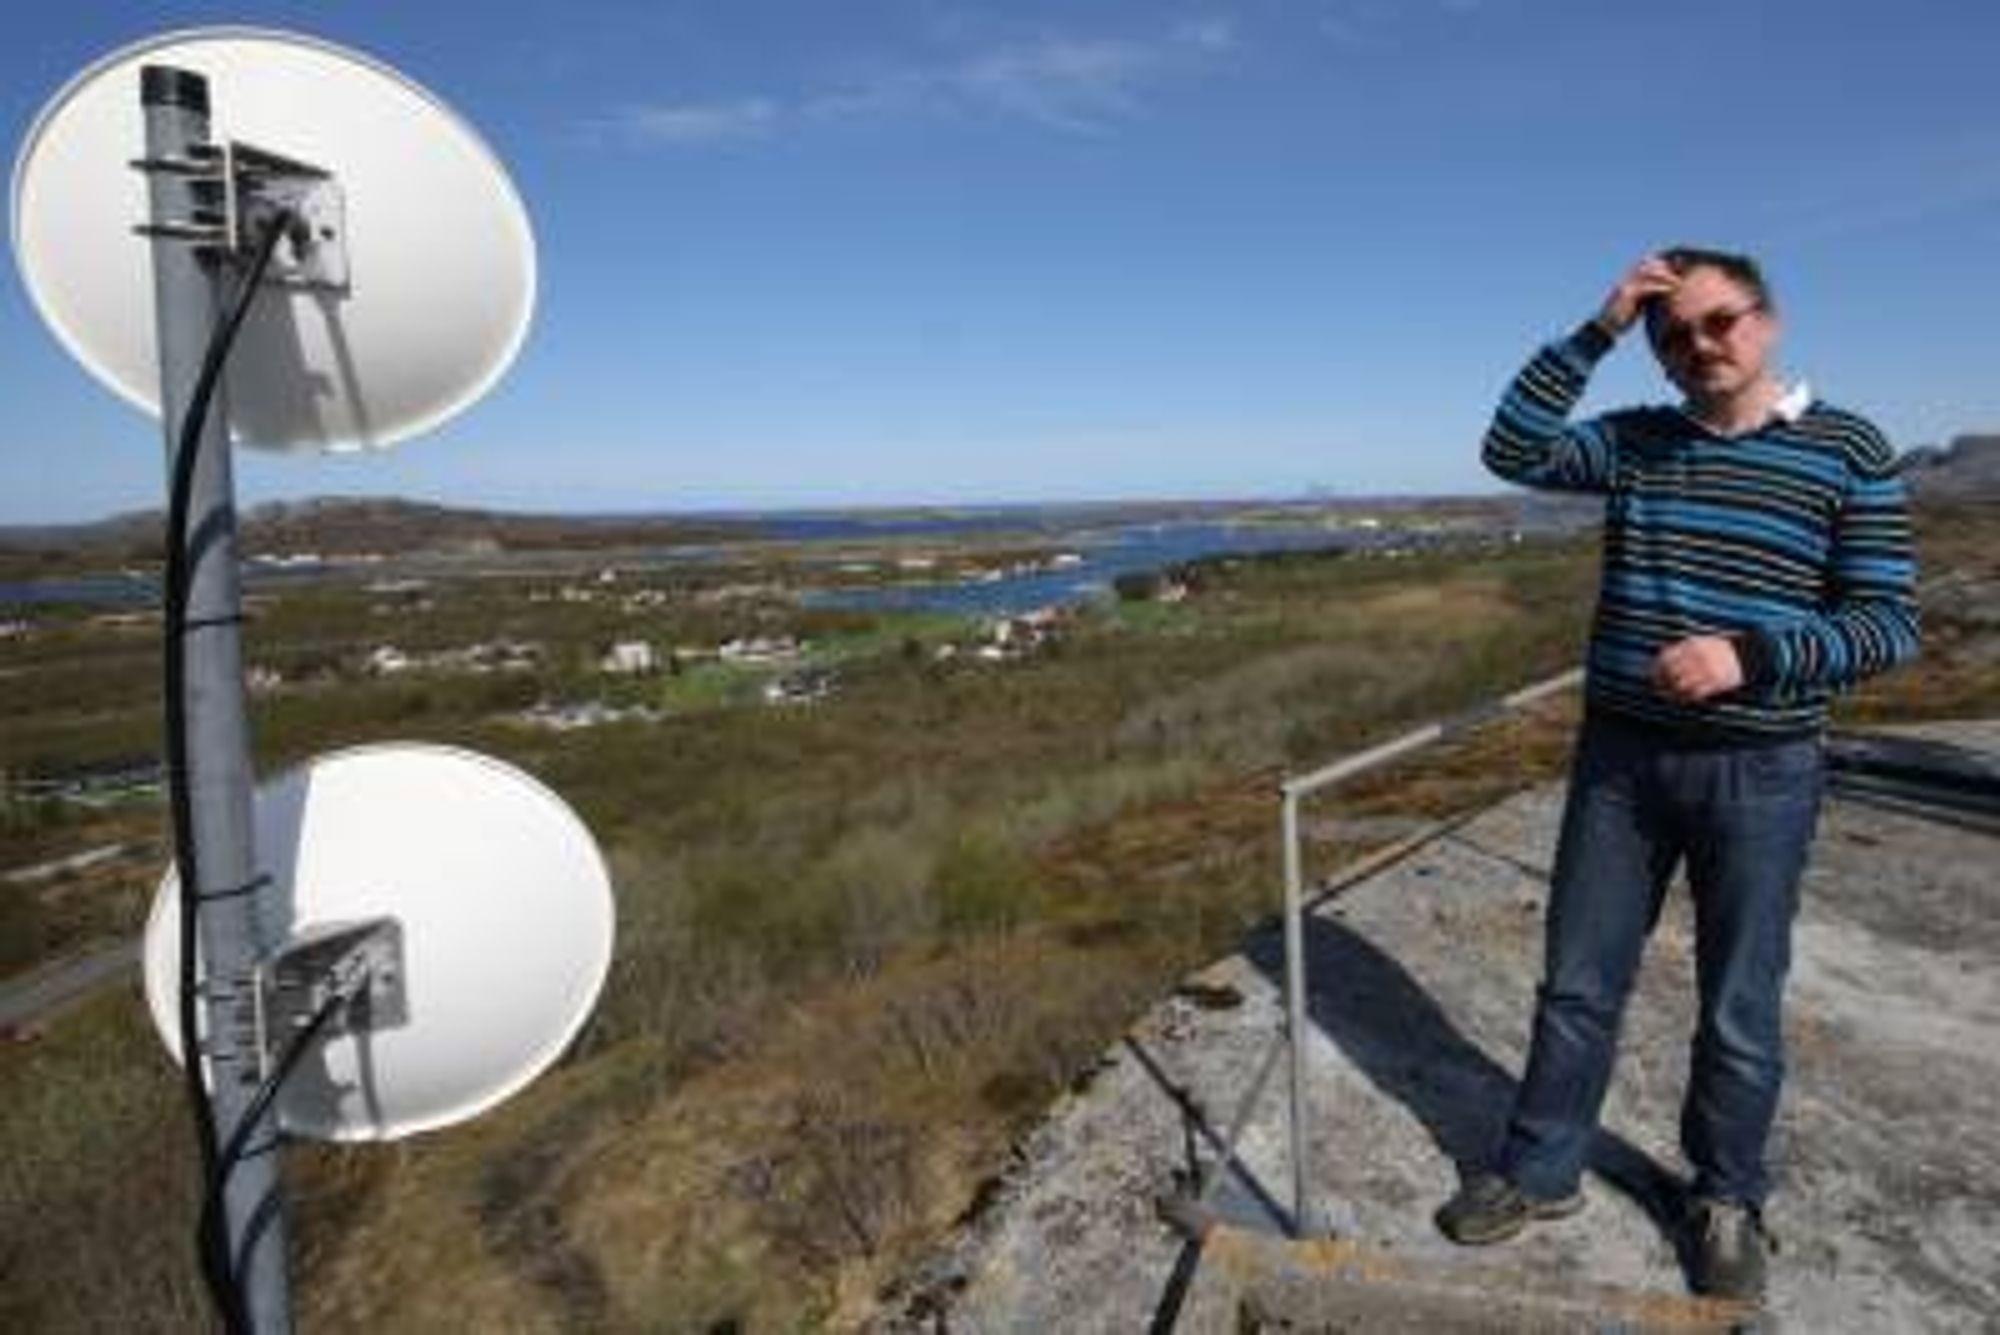 IT-konsulent Svein Lundestad i Herøy kommune legger ikke skjul på at dagens trådløse forbindelser med wlan-signaler utendørs ikke holder mål.